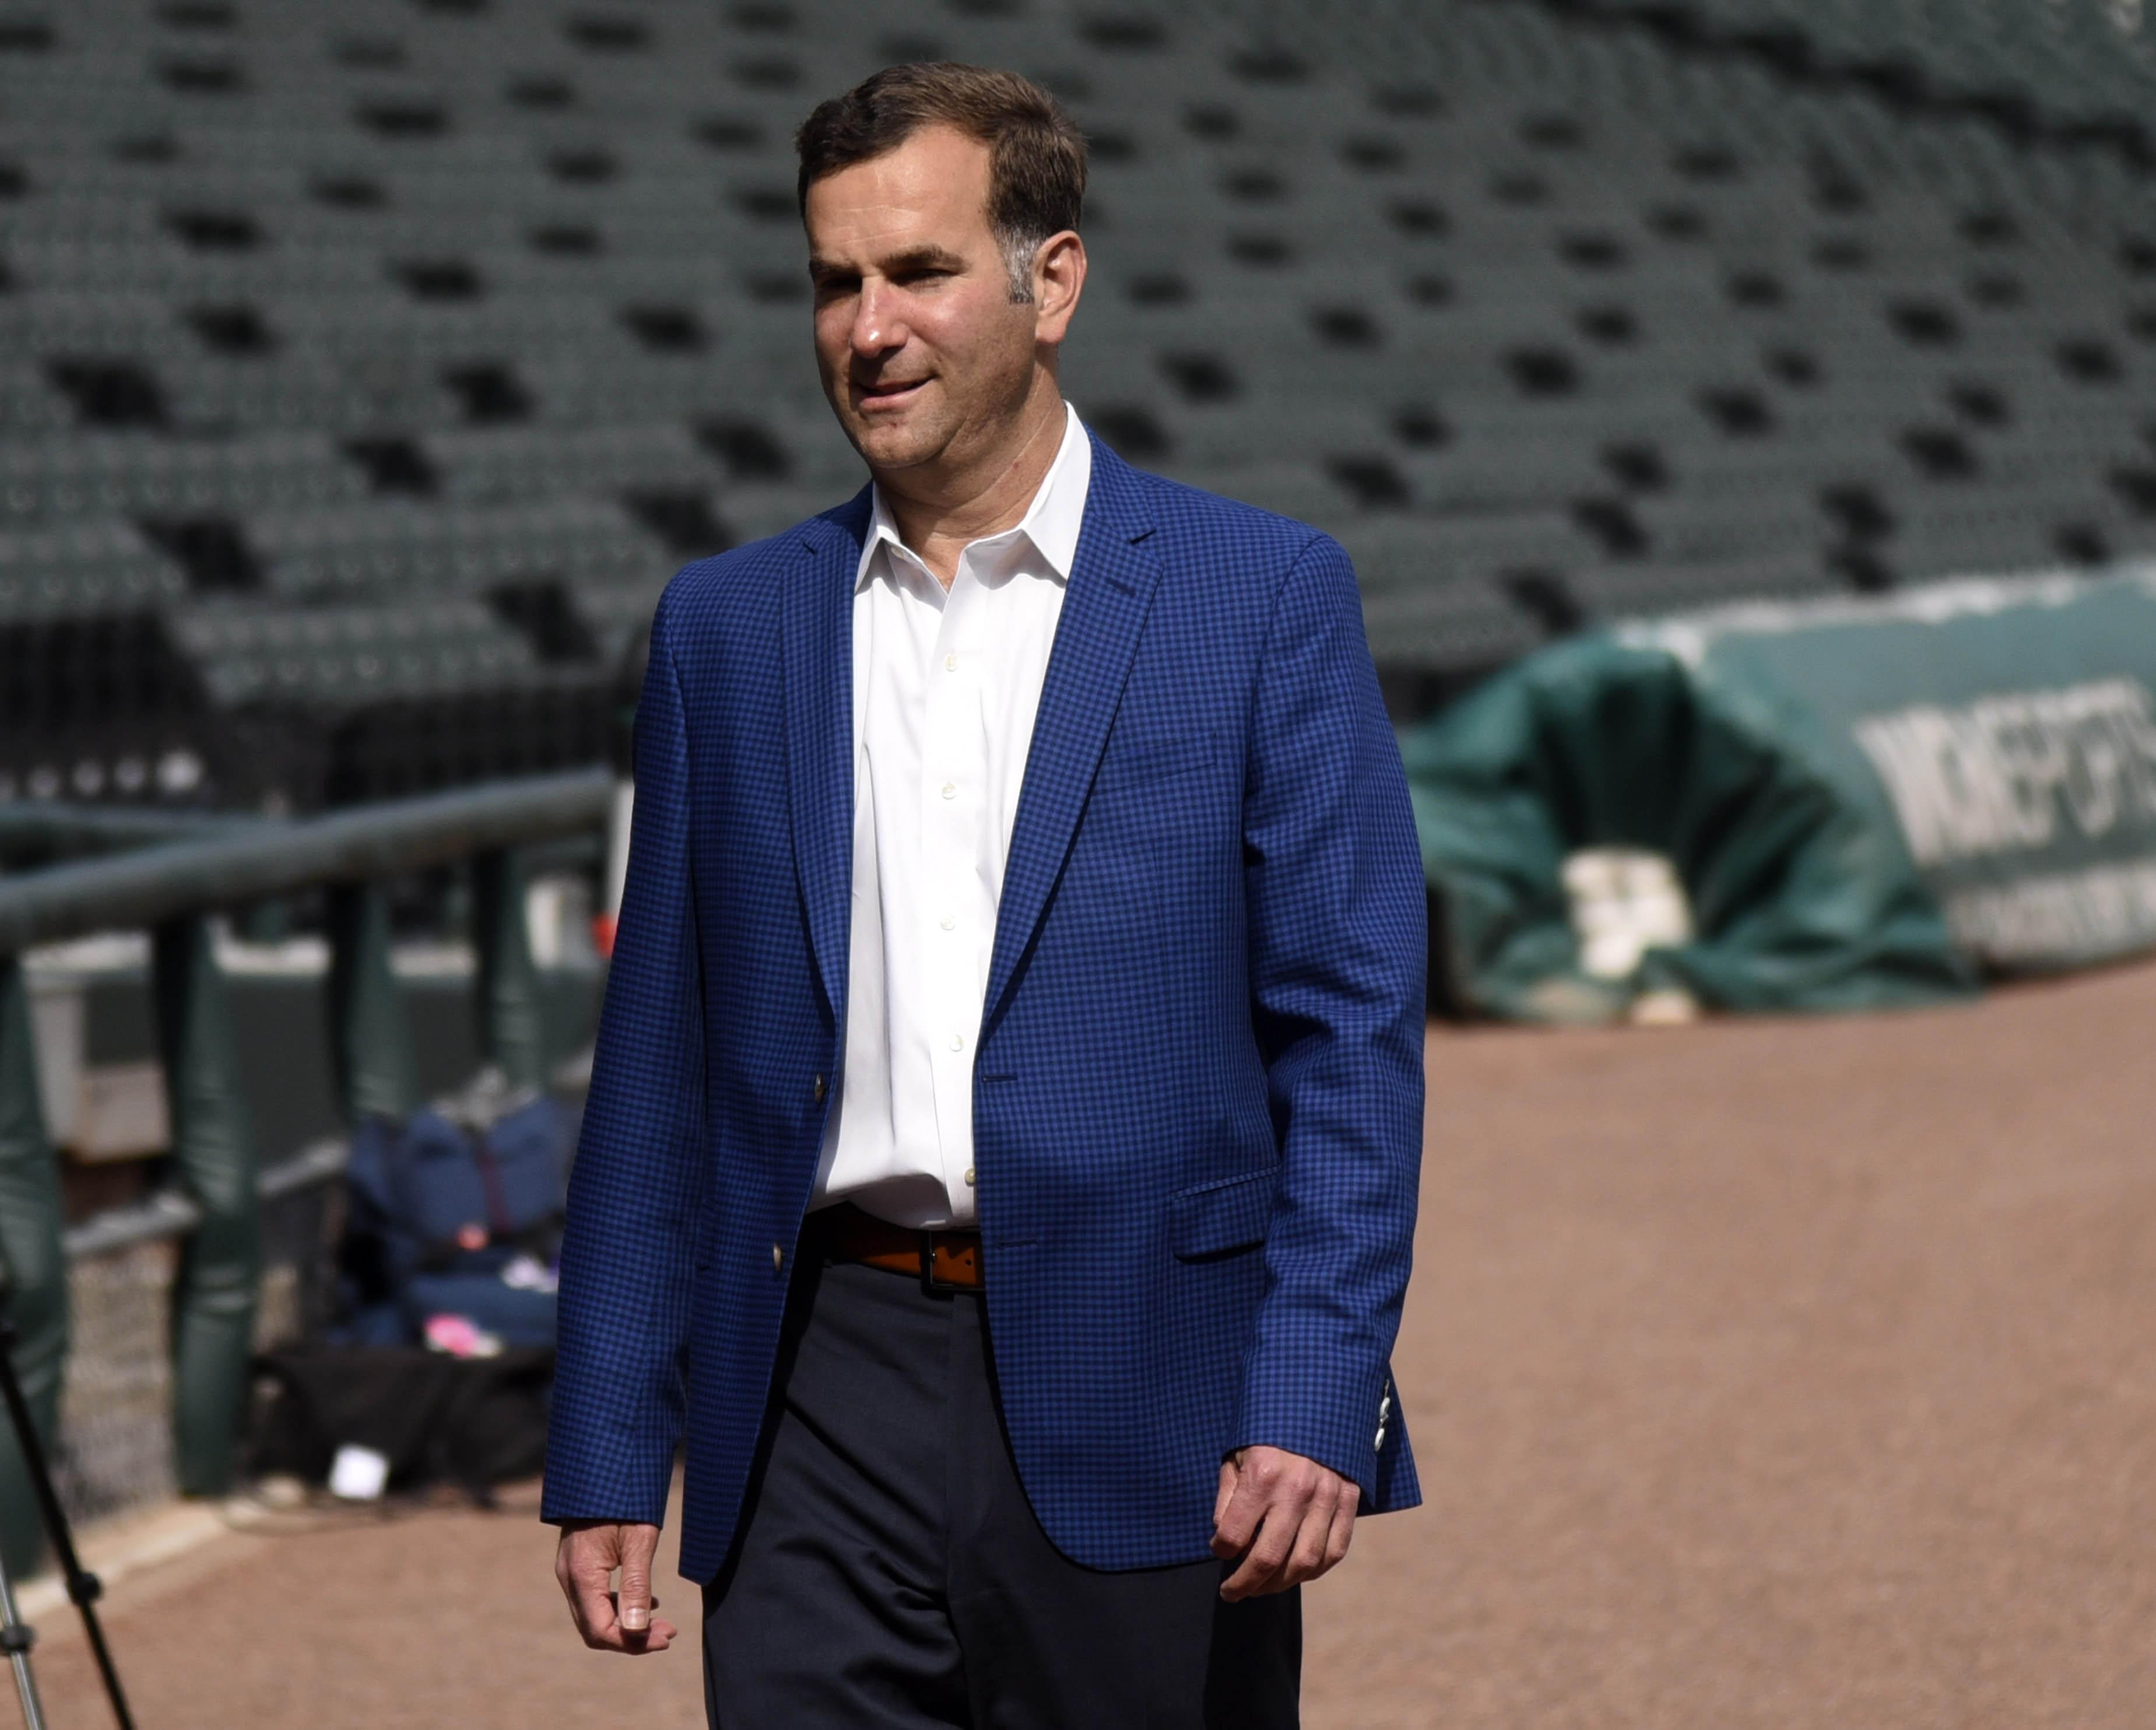 MLB: Houston Astros at Chicago White Sox